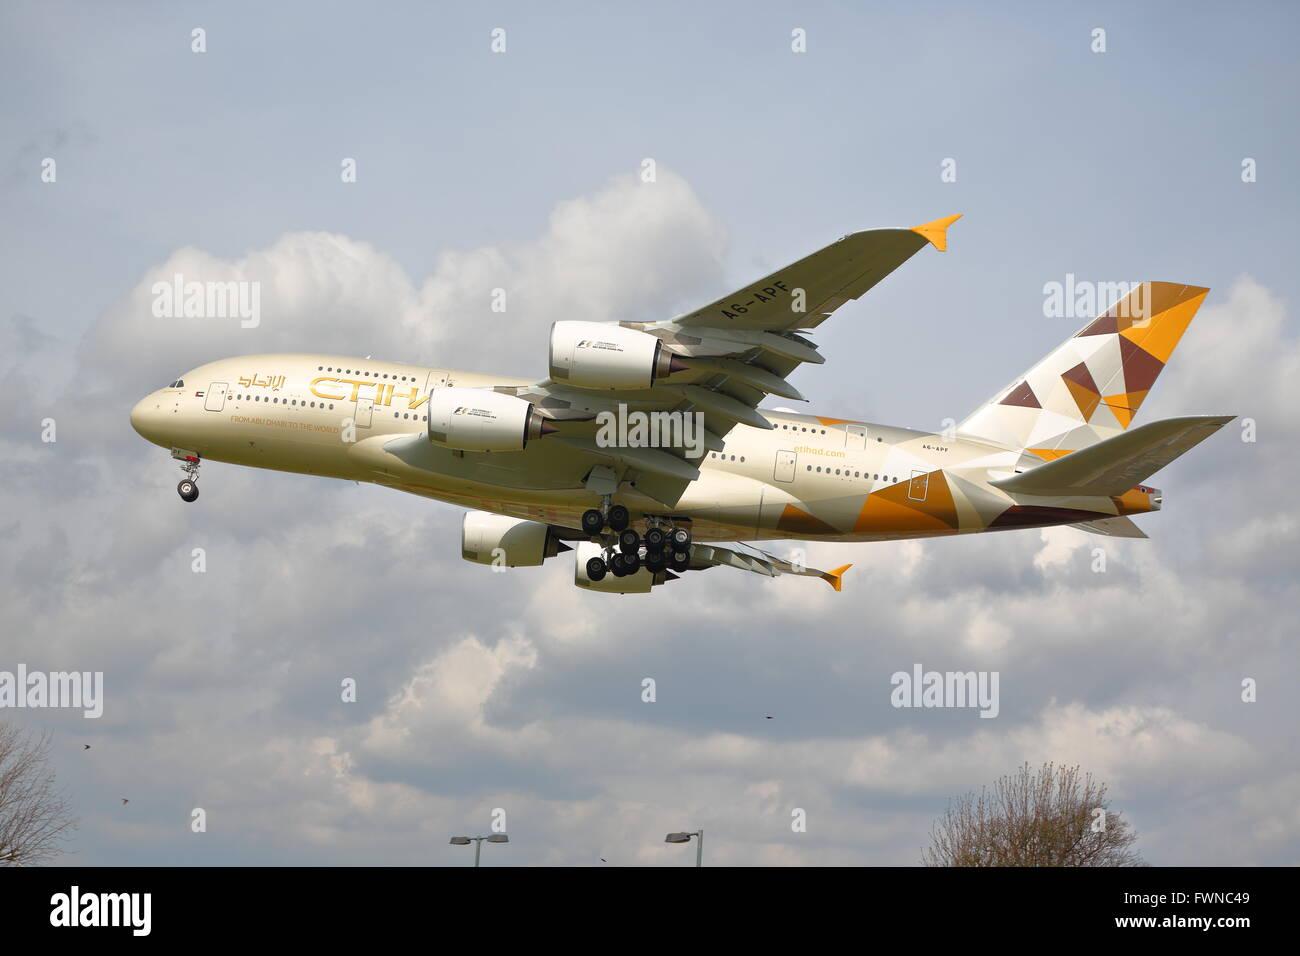 Etihad Airways Airbus A380-800 A6-APF approaching London Heathrow Airport, UK - Stock Image